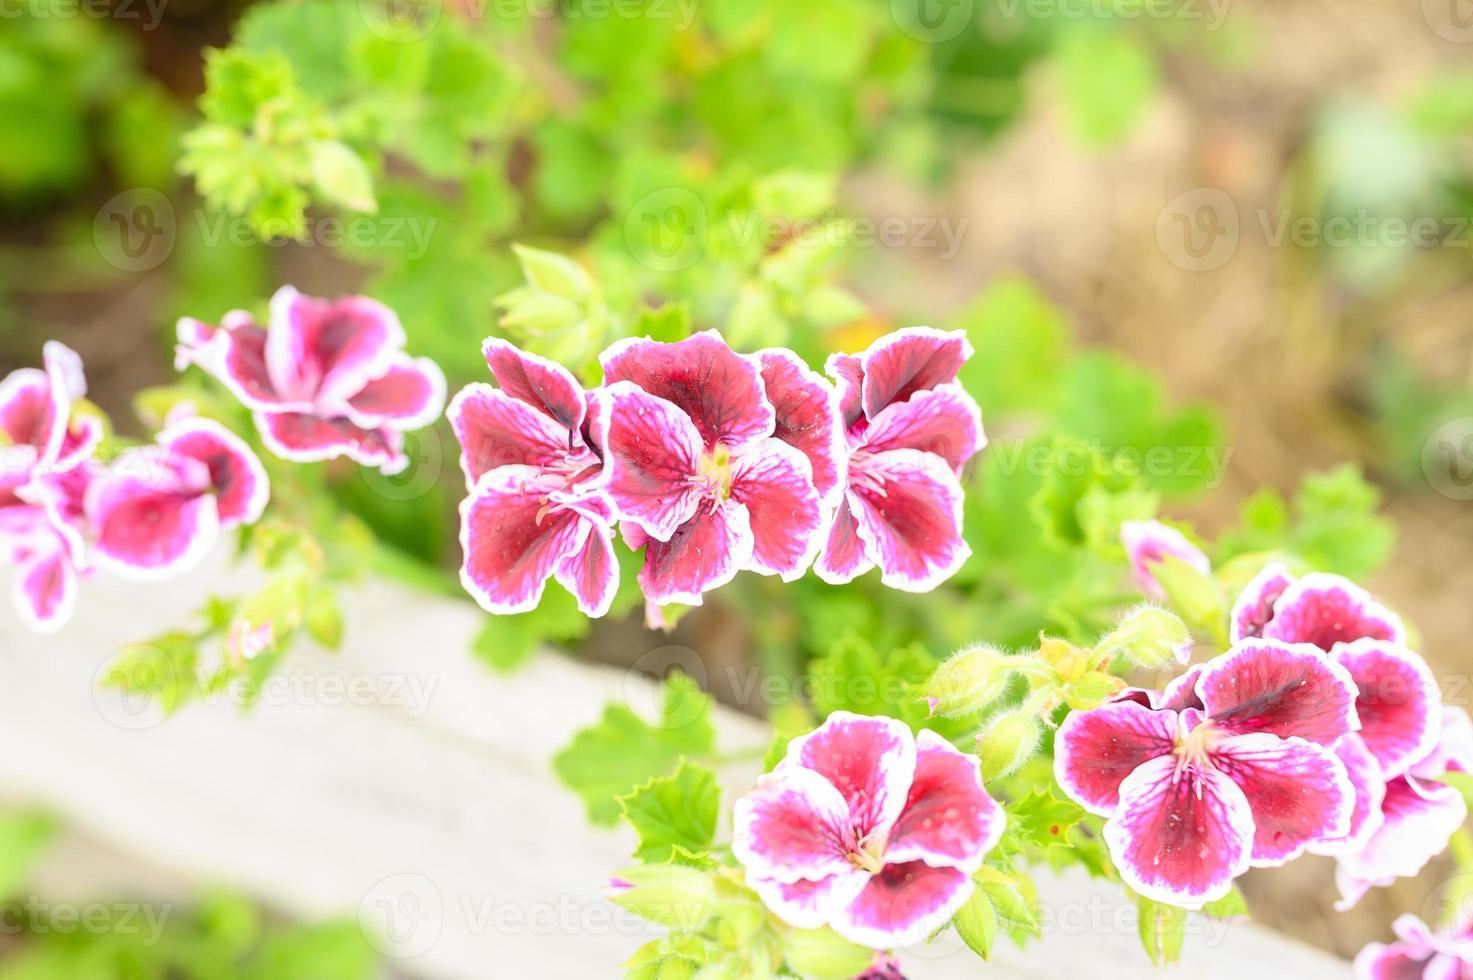 Pink pelargonium flowers in full bloom in the garden photo